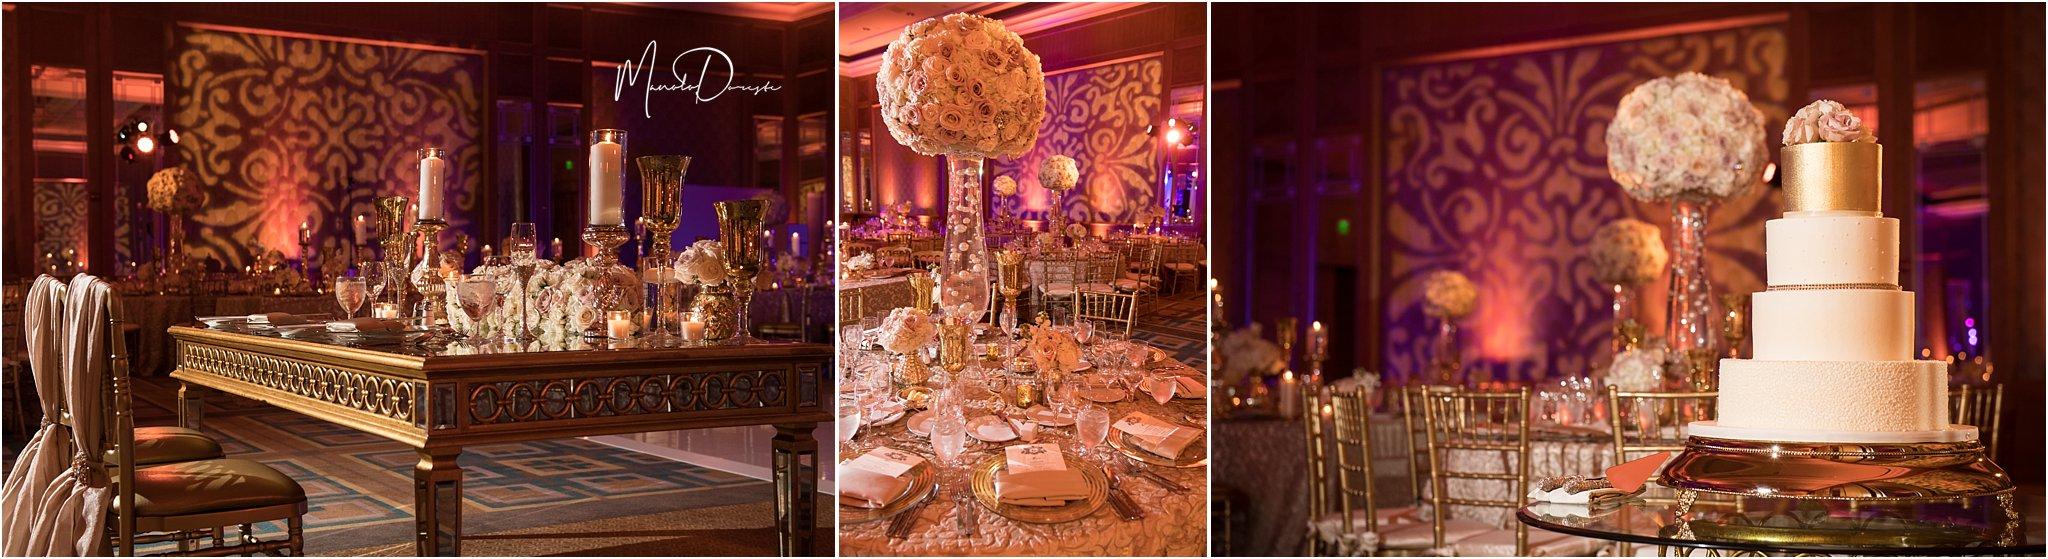 00729_ManoloDoreste_InFocusStudios_Wedding_Family_Photography_Miami_MiamiPhotographer.jpg